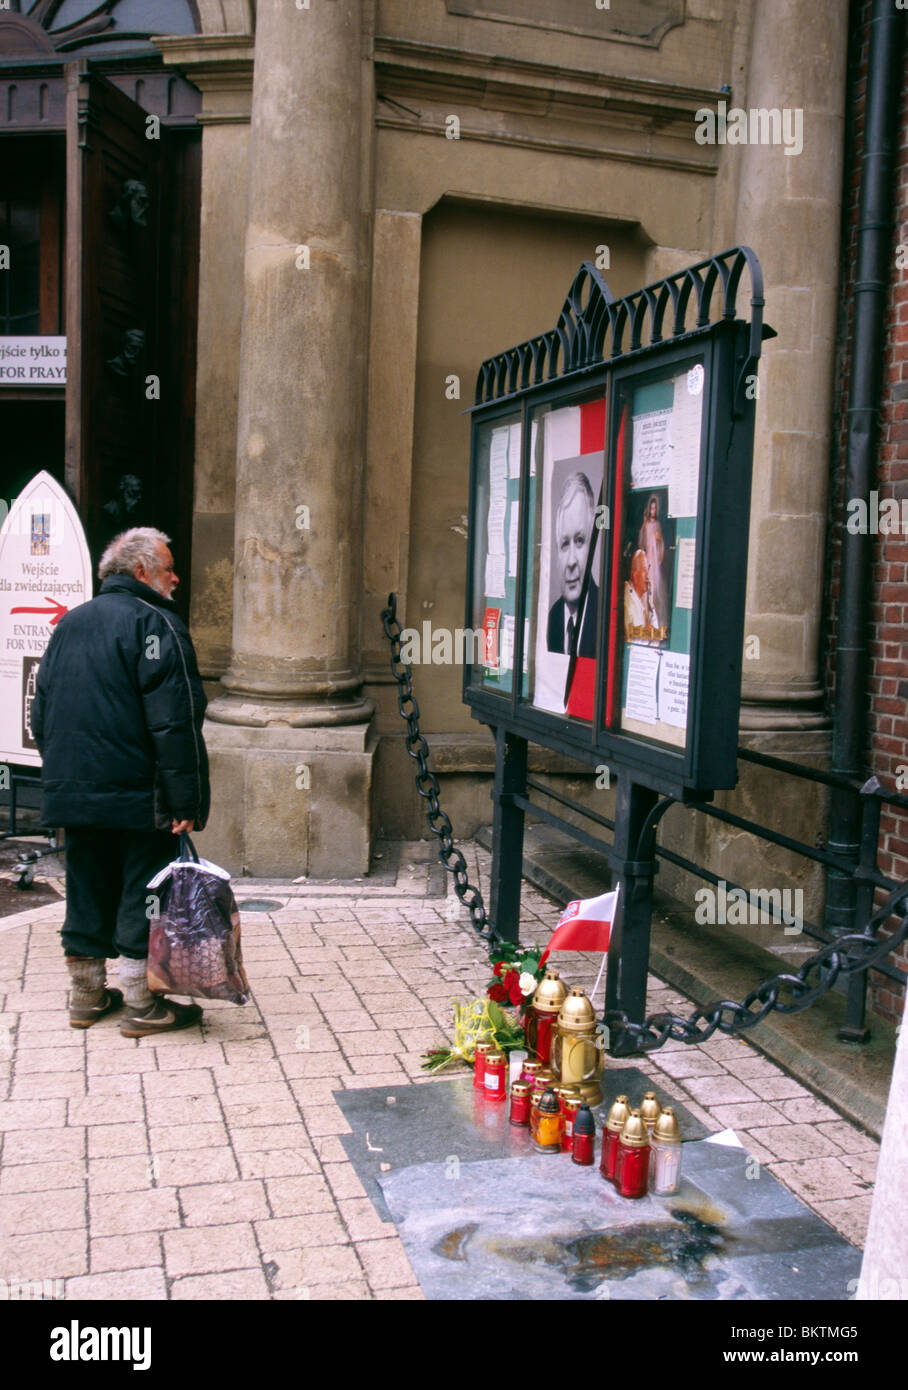 Krakow, 10 April 2010 -- Improvised memorial for President Lech Aleksander Kaczyński on the day he died in the crash - Stock Image